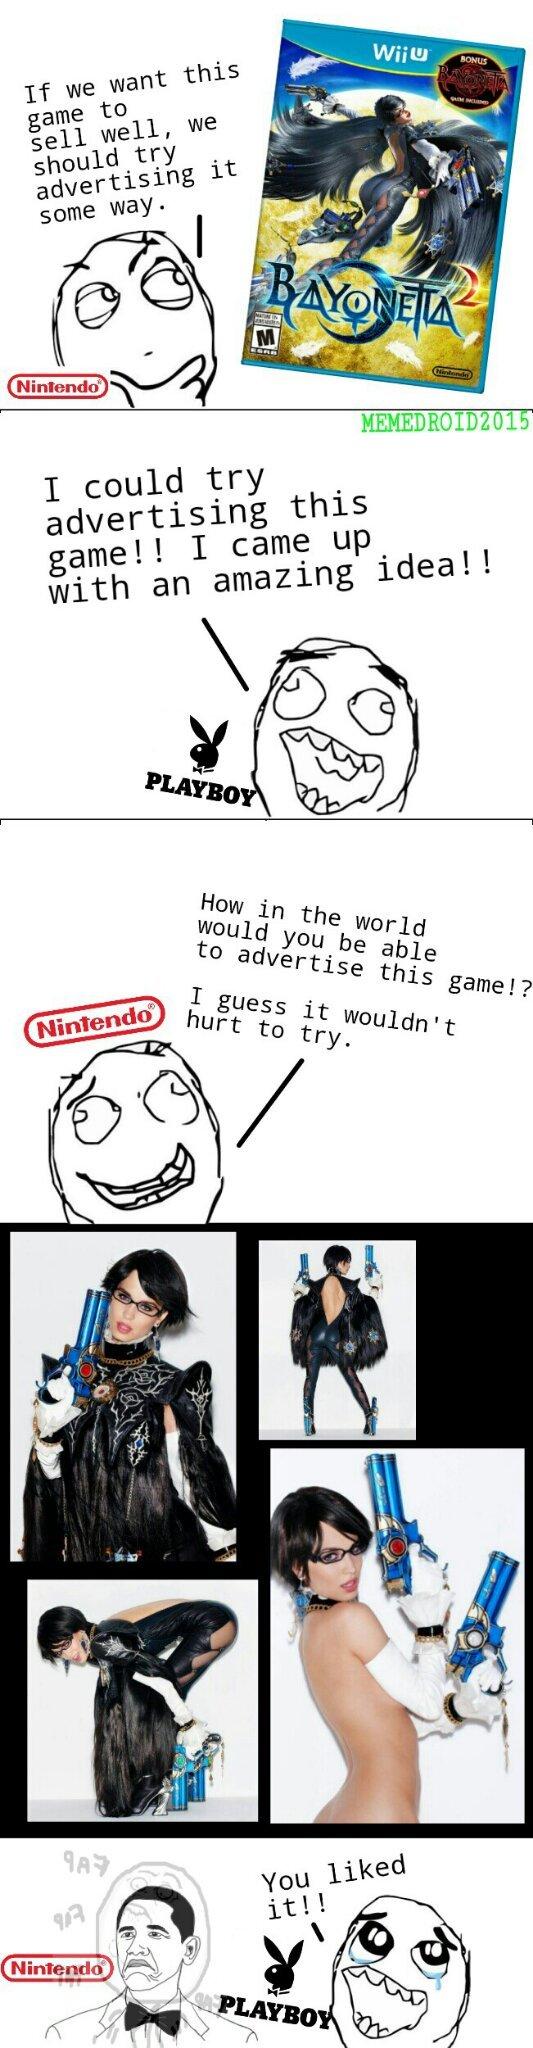 Favorite female videogame character? :megusta: - meme